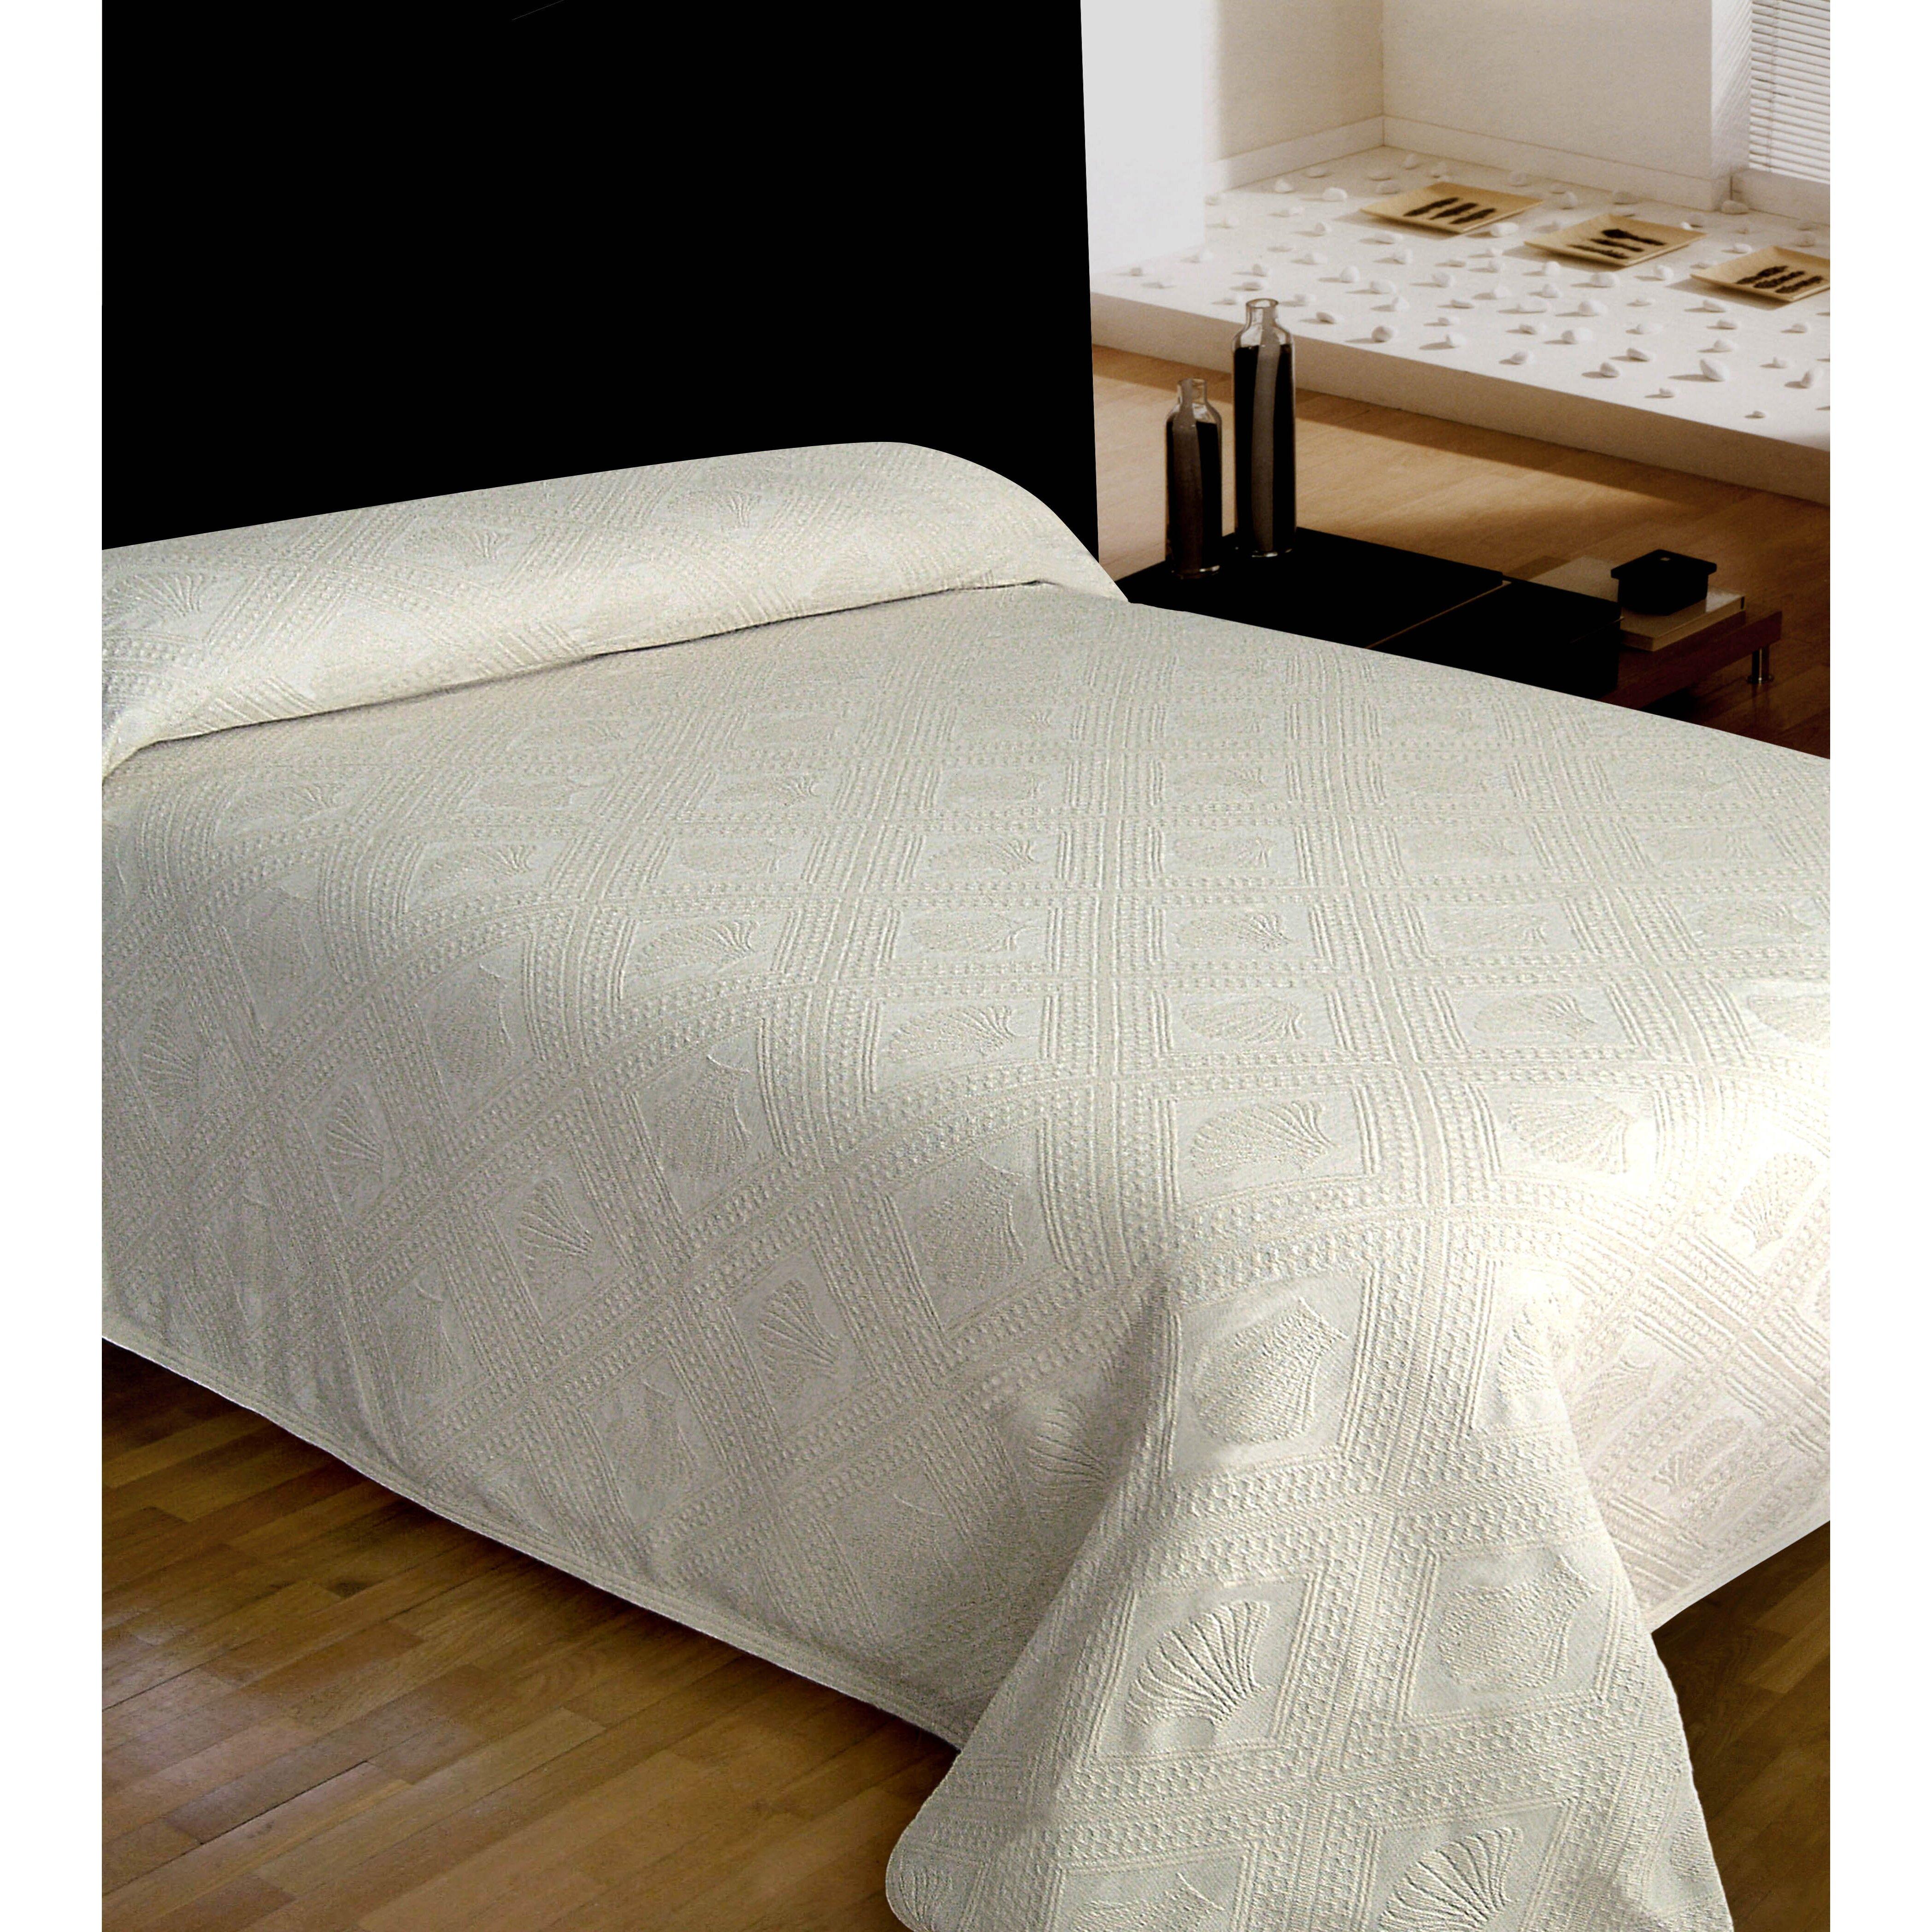 Bargoosehometextiles Jacquard Bedspread Amp Reviews Wayfair